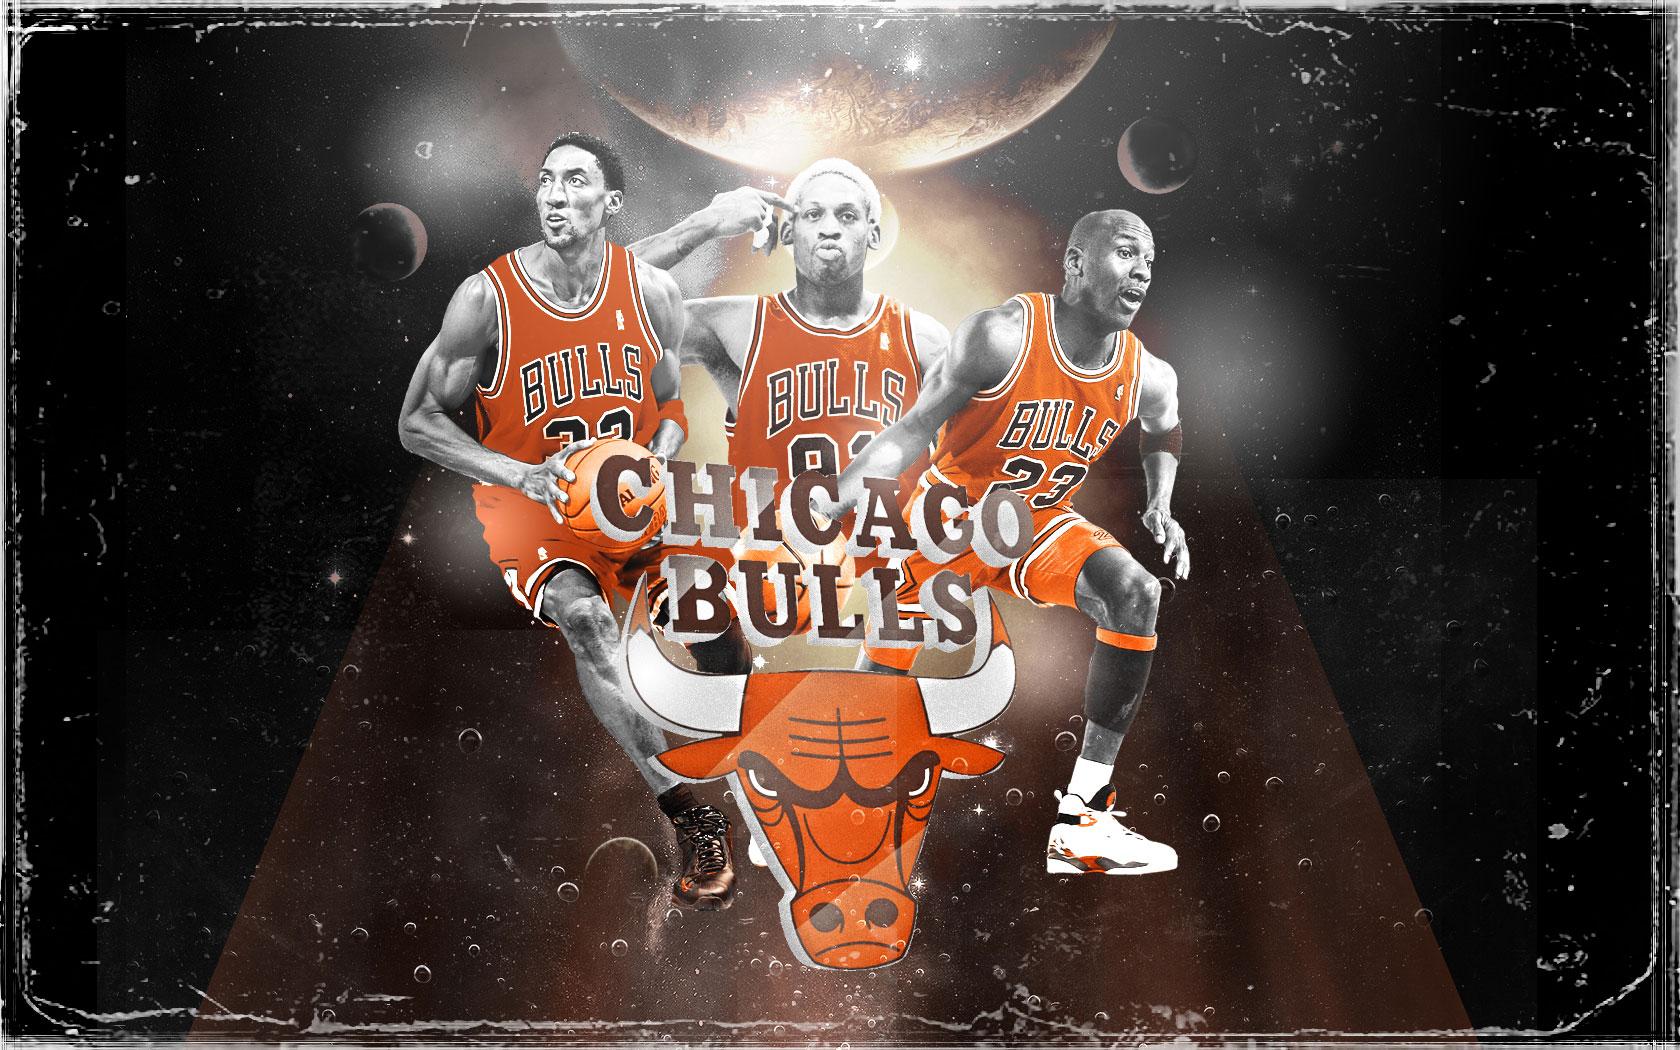 Chicago bulls 90s bulls big 3 widescreen wallpaper basketwallpapers voltagebd Images